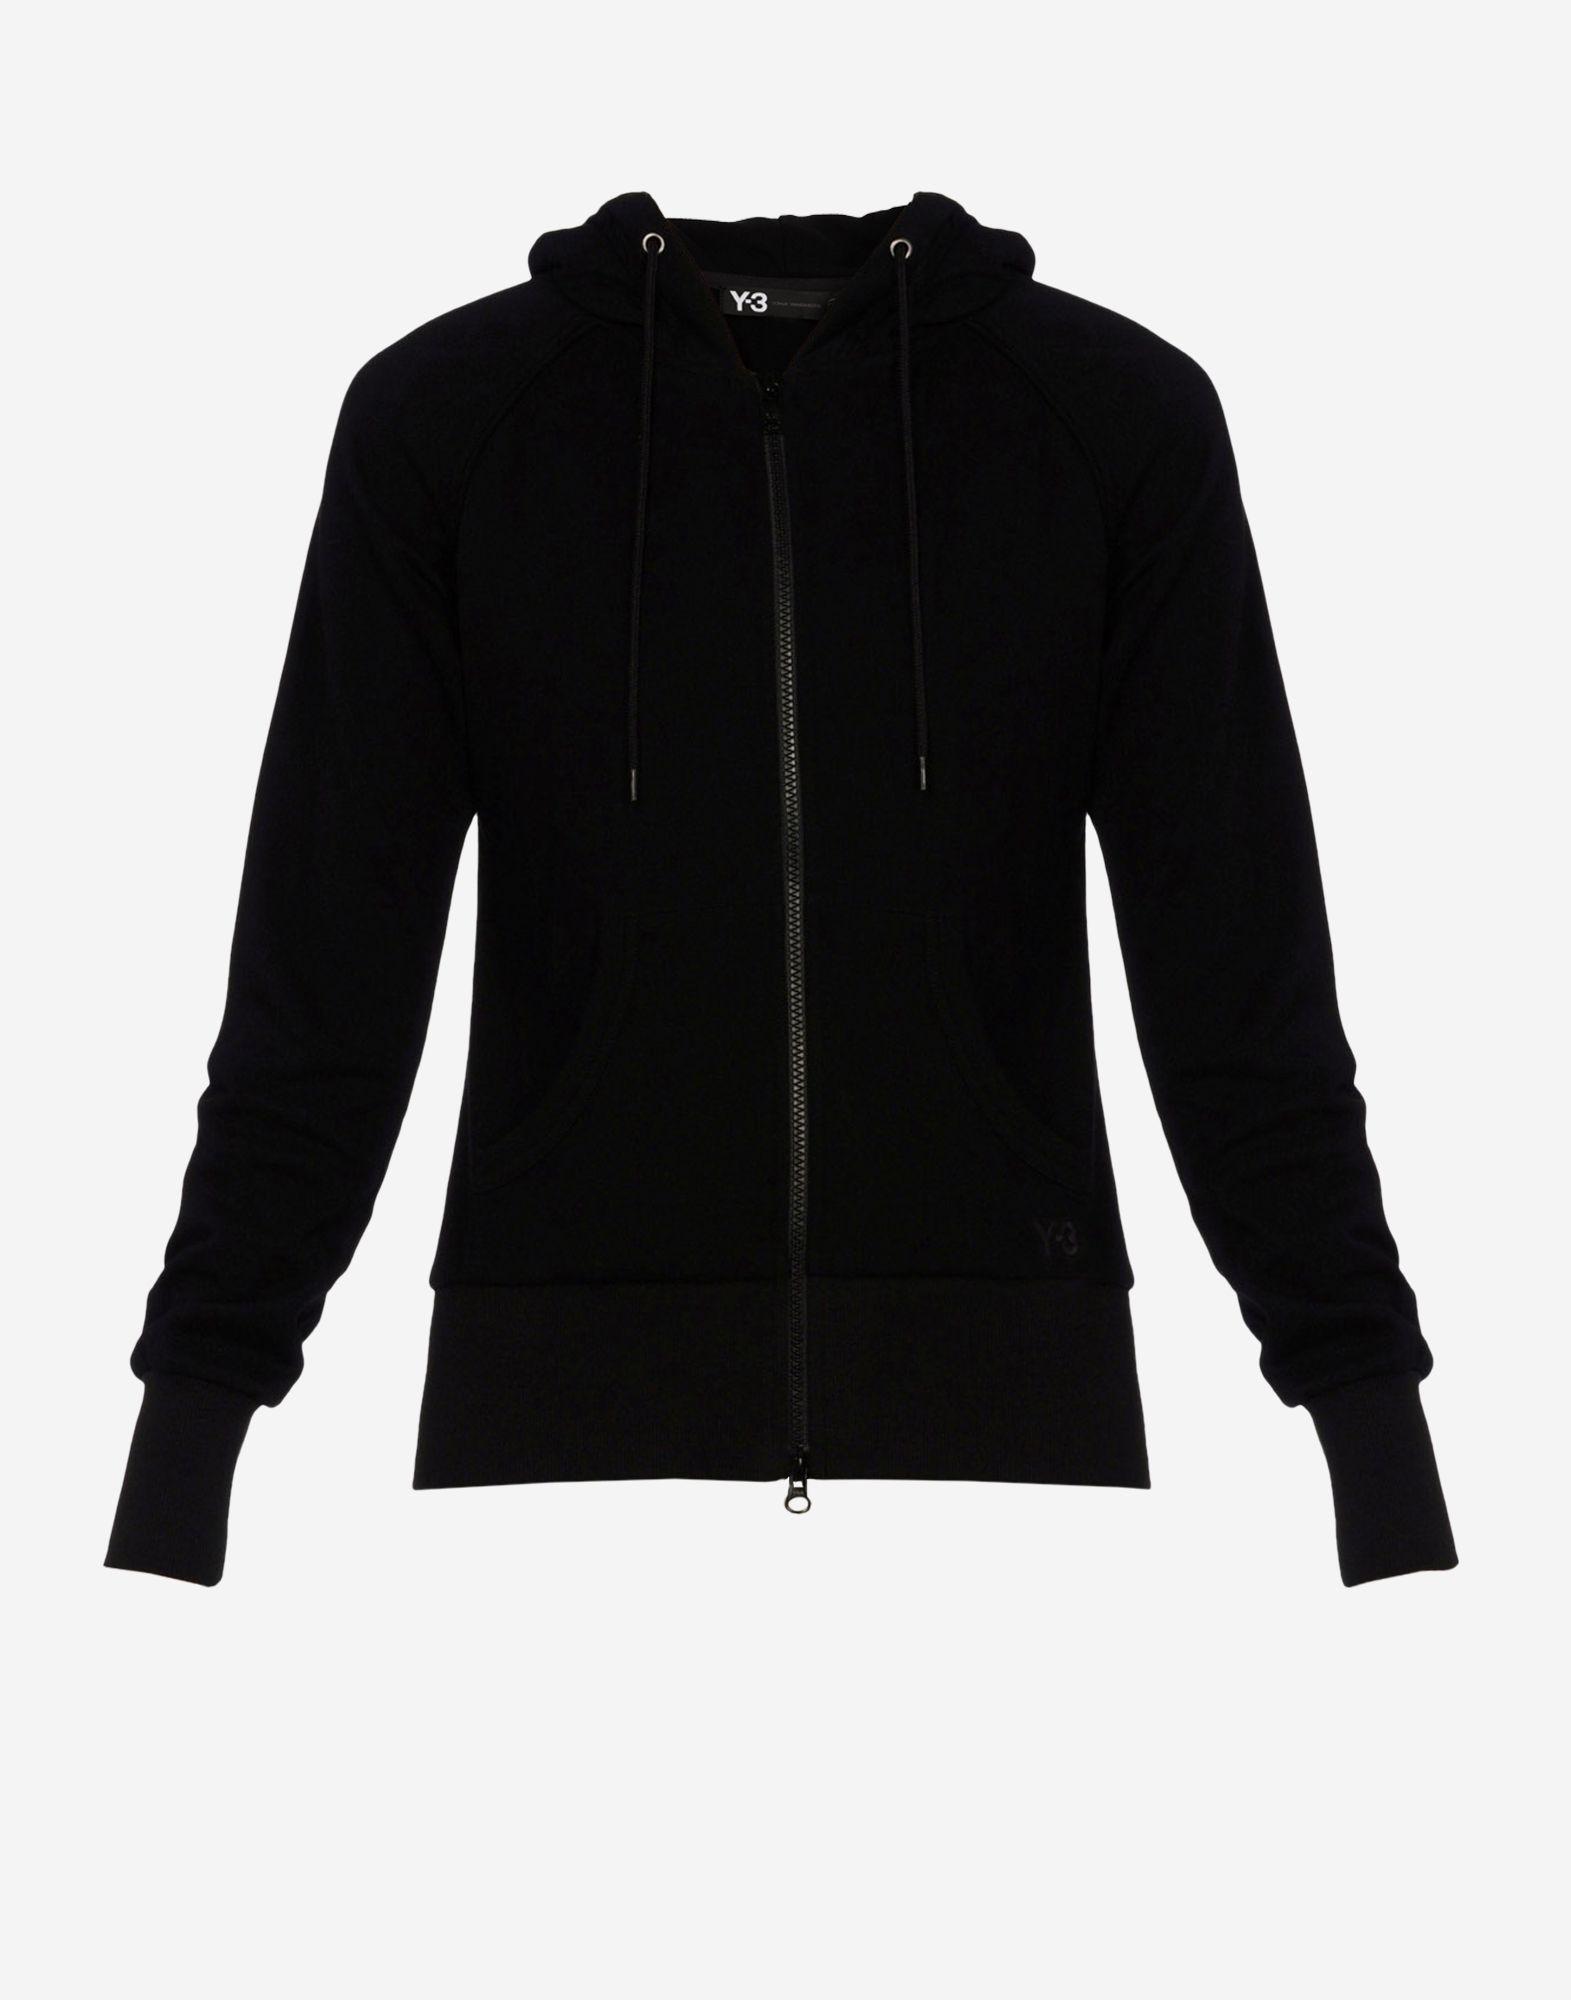 Y 3 FT Light Zip Hoodie Sweatshirts Mit Kapuze